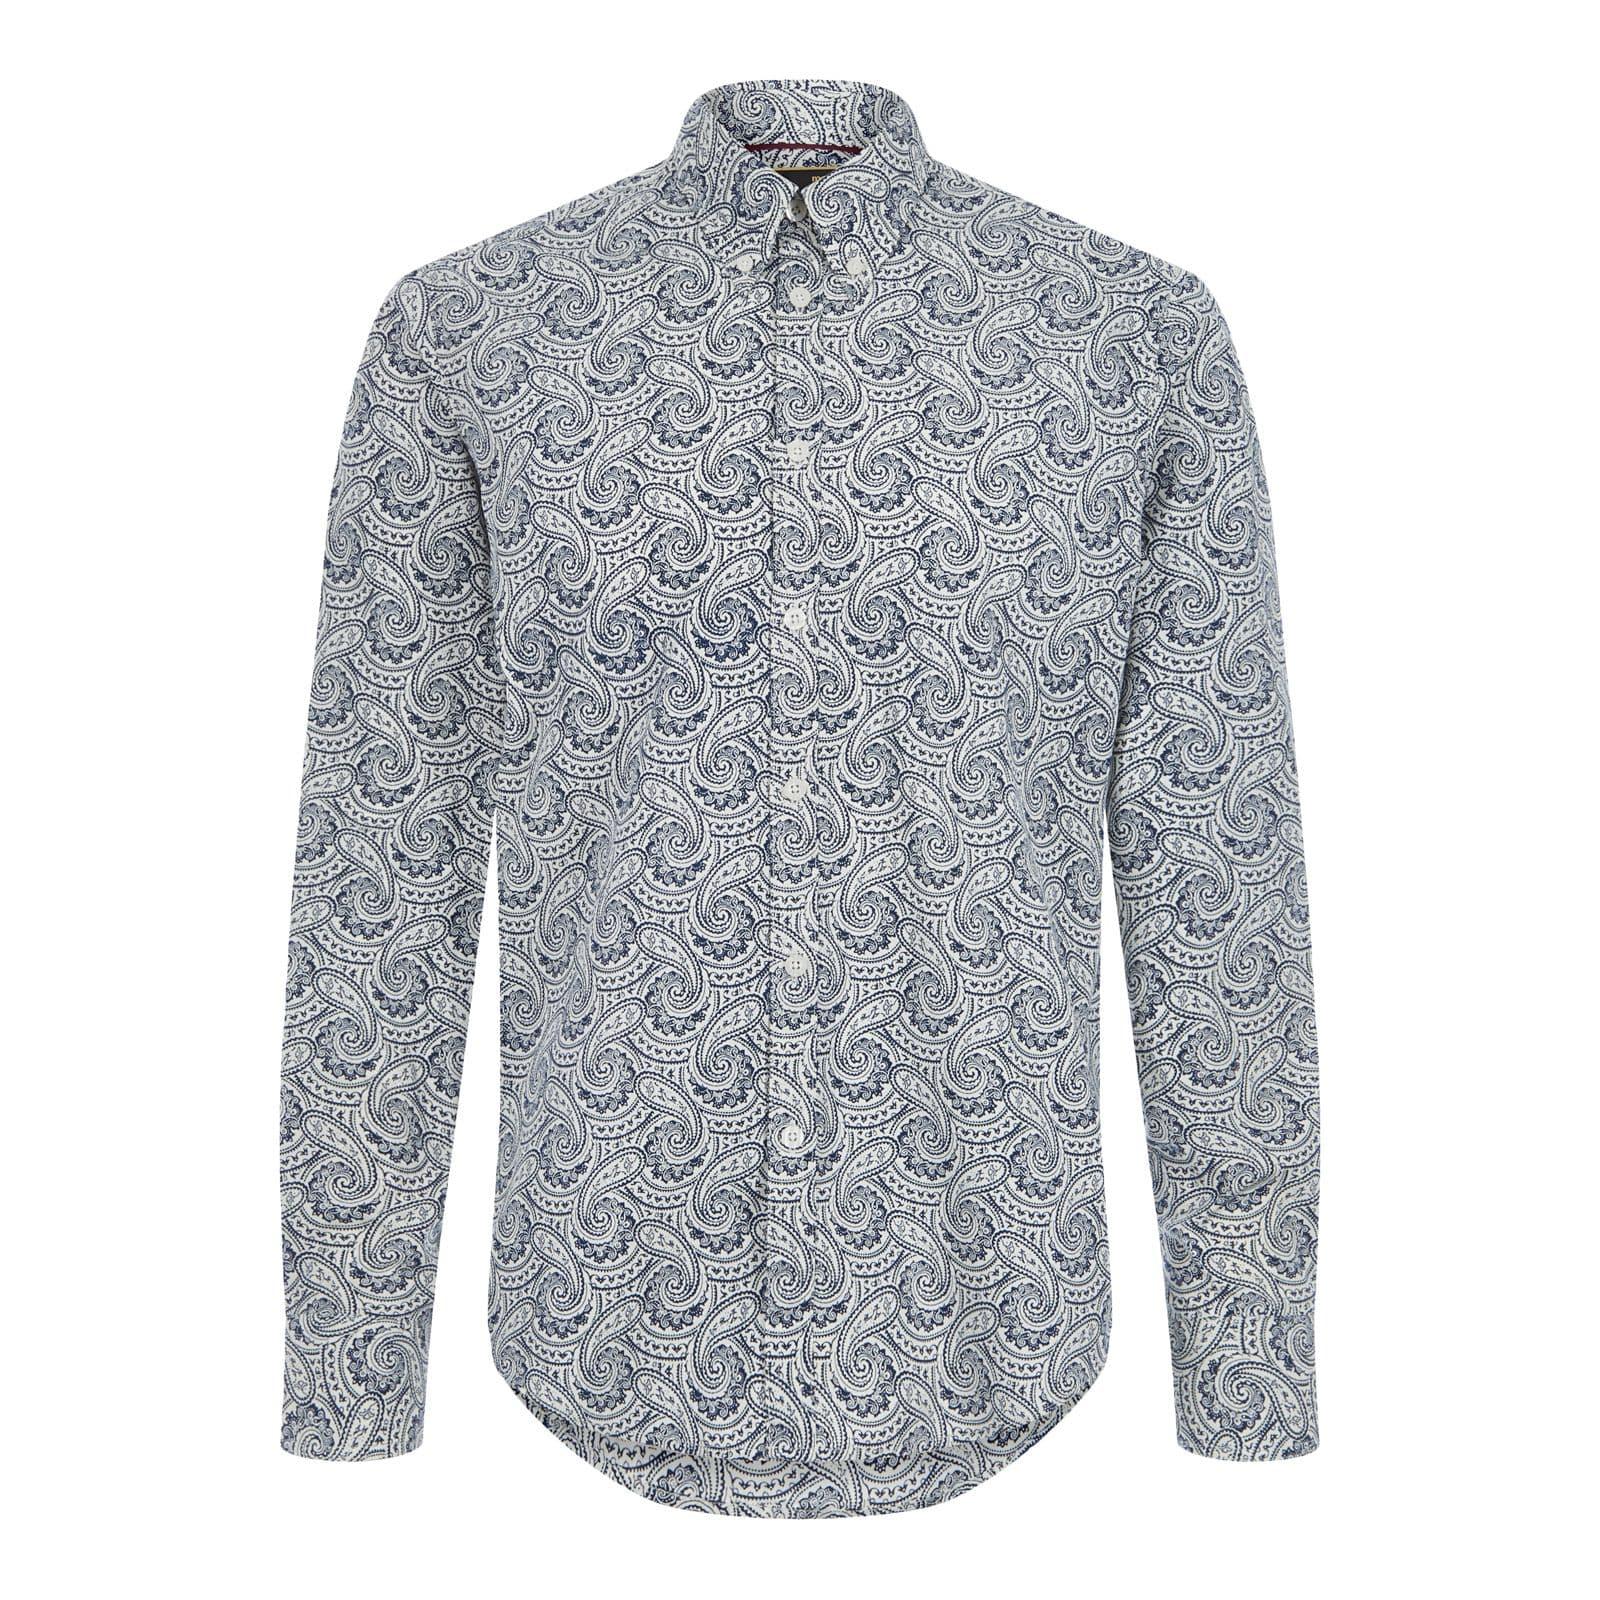 Рубашка PatchamРубашки под заказ<br><br><br>Артикул: 1517109<br>Материал: 100% хлопок<br>Цвет: синий с белым<br>Пол: Мужской